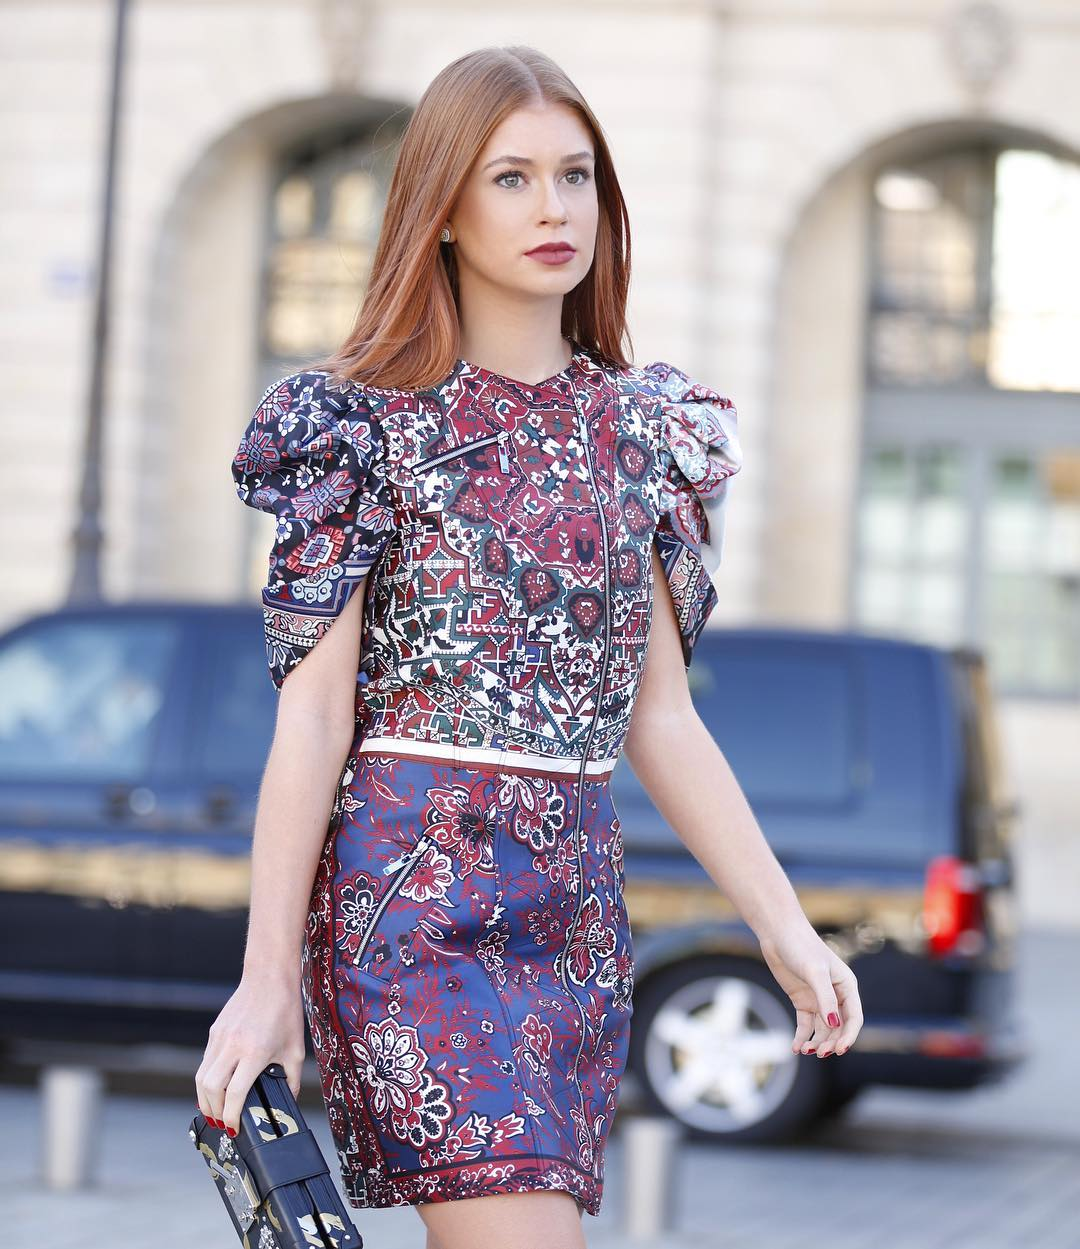 Marina Ruy barbosa com vestido roxo